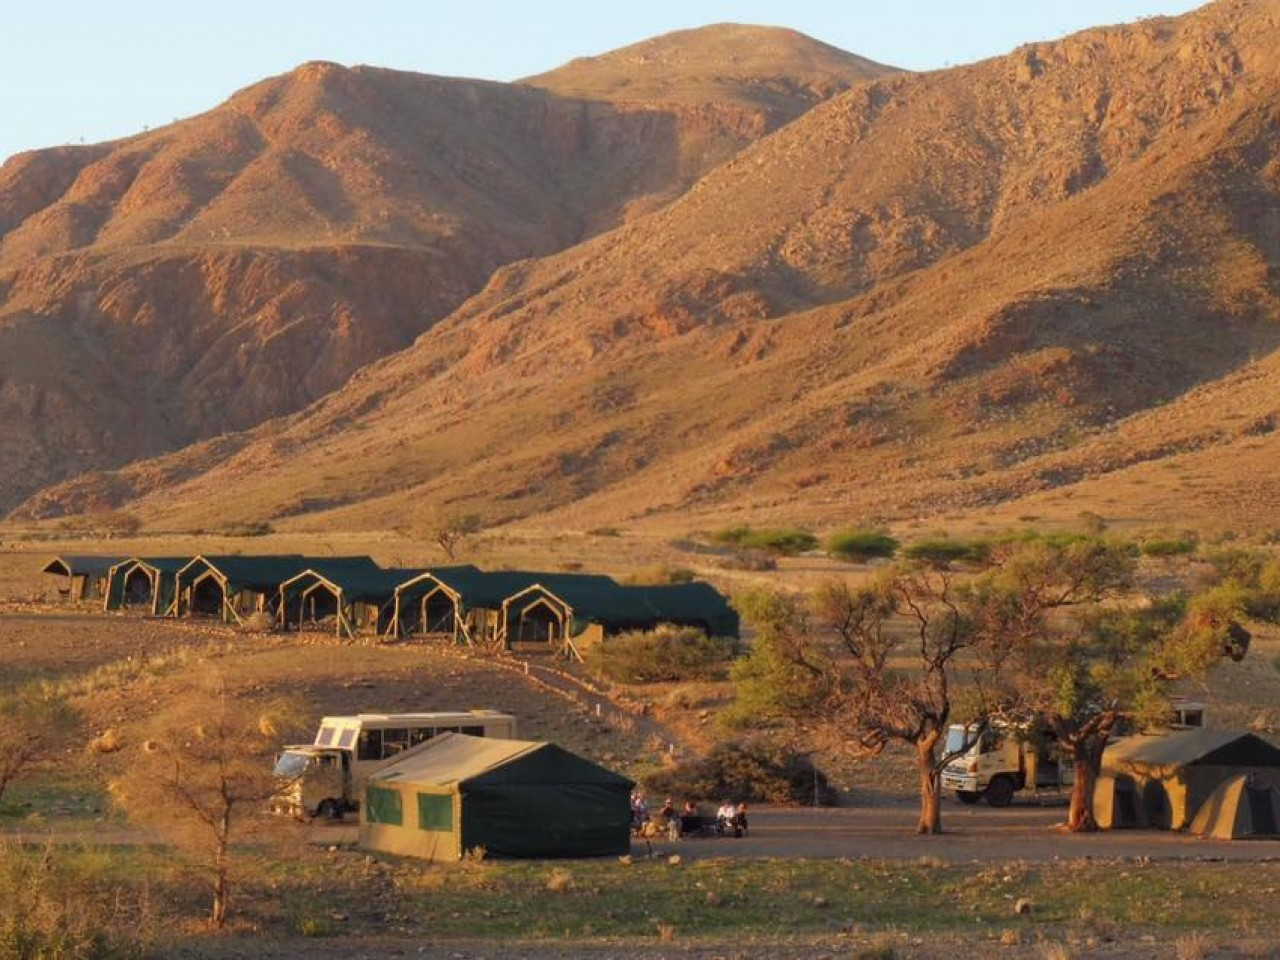 Namibia in truck e campi tendati mobili